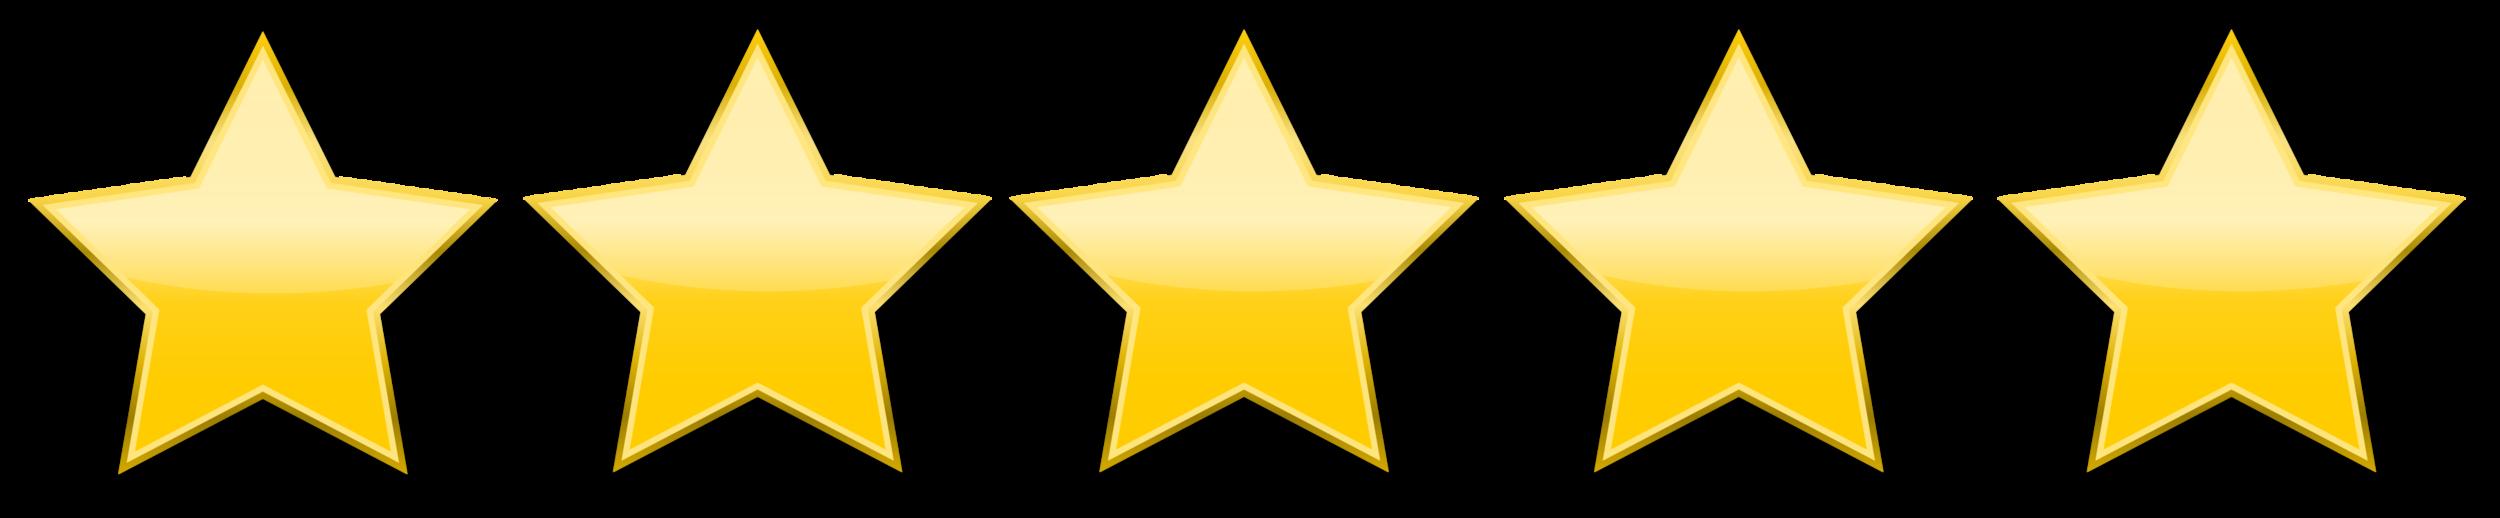 Soho Picture Framing 5 gold stars